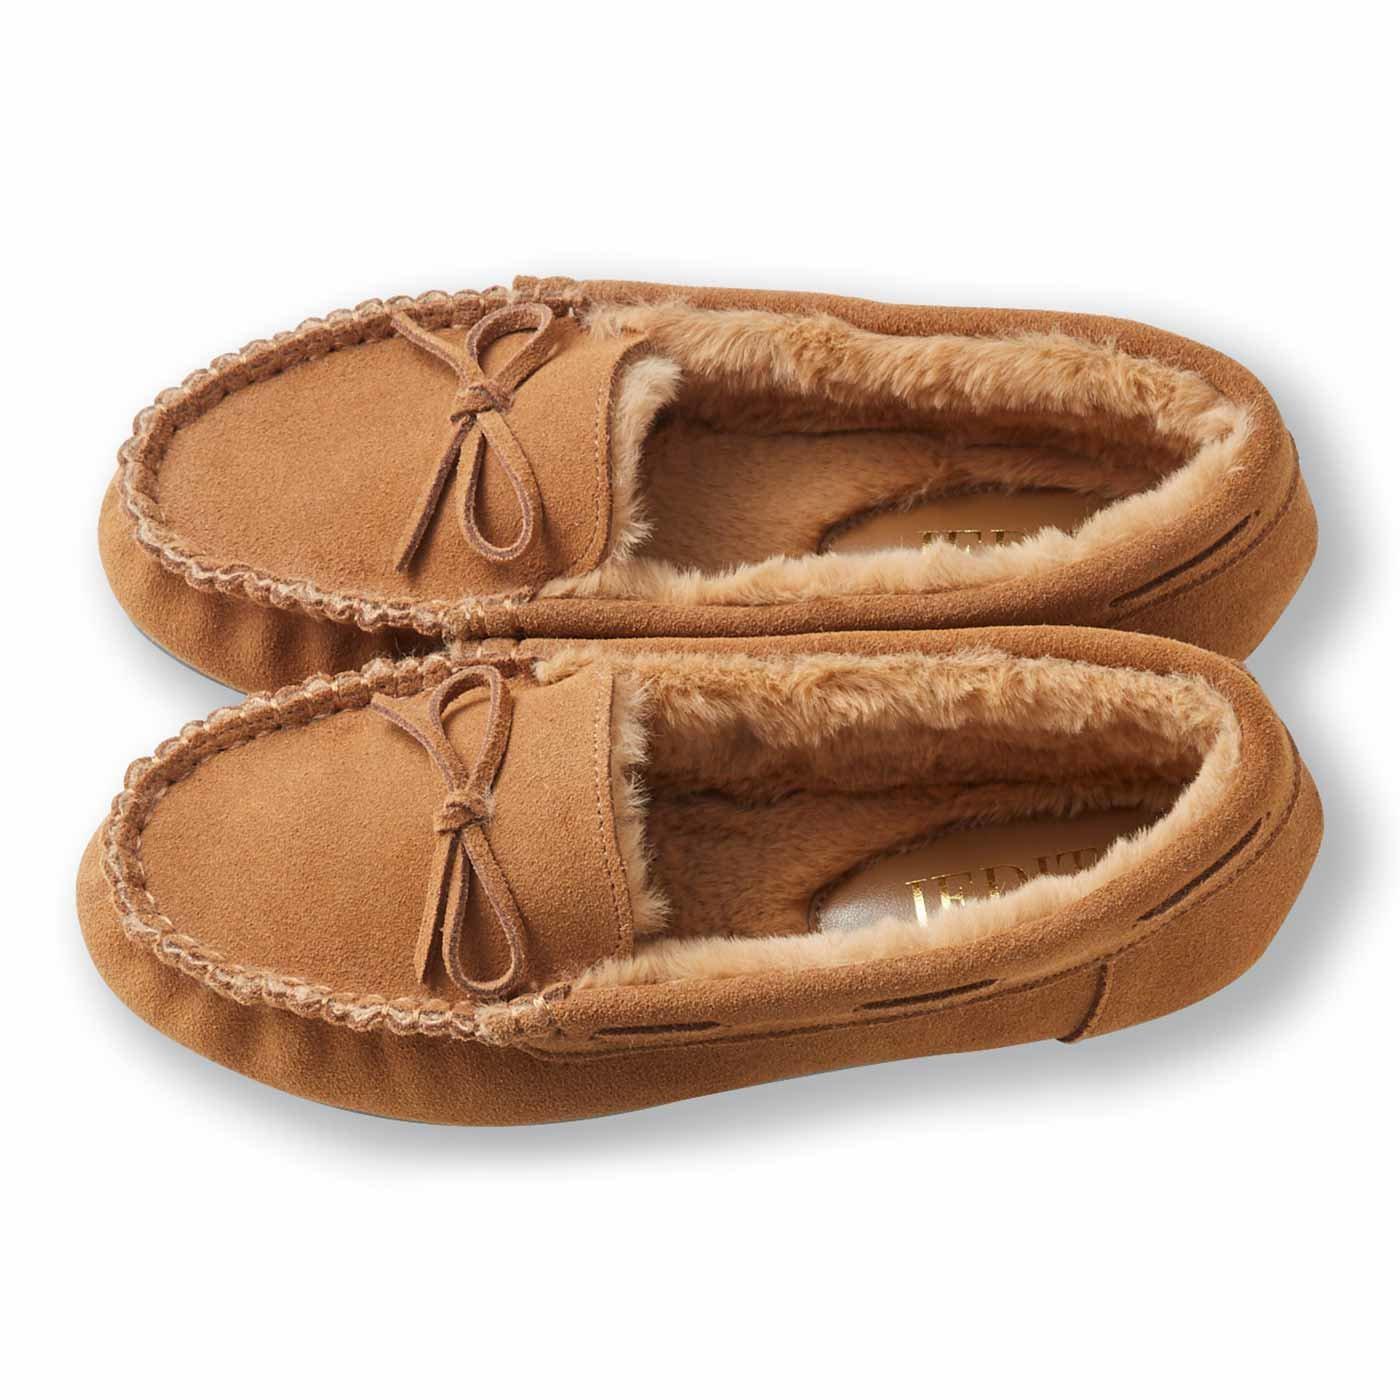 IEDIT[イディット] とっても暖かい履き心地の表側は本革のふわふわモカシン風シューズ〈キャメル〉